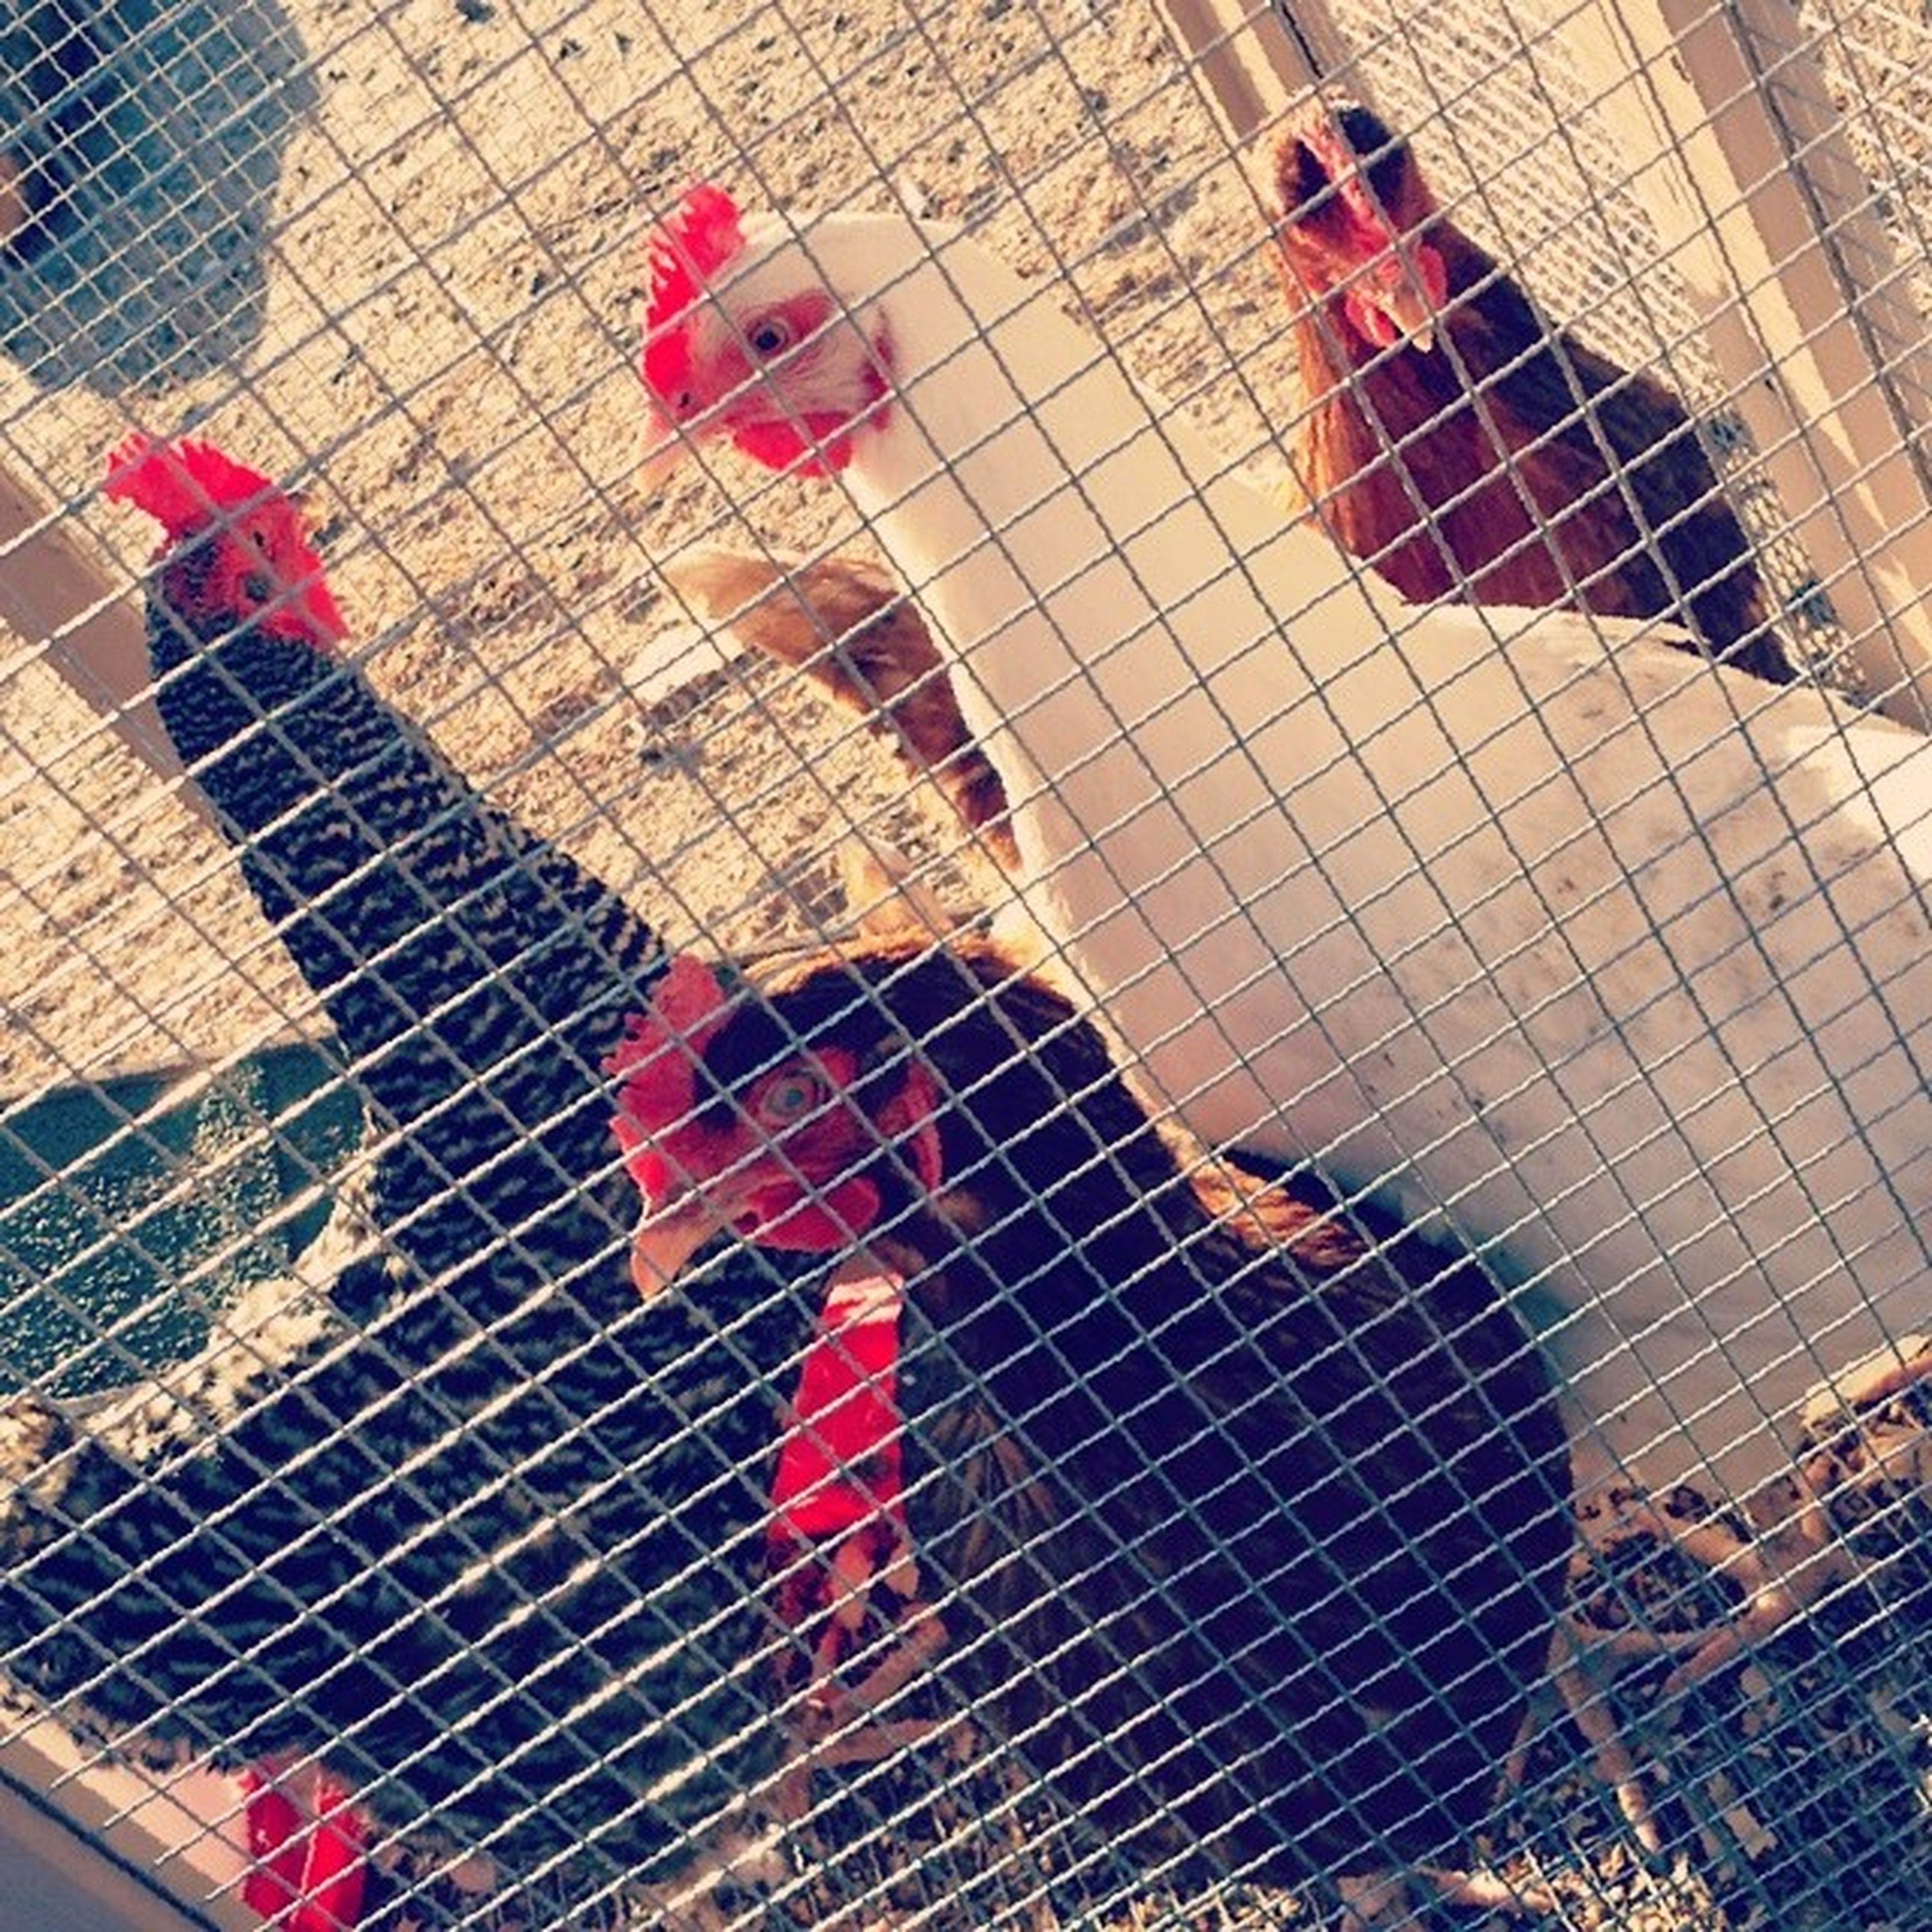 Backyard Chickens Dagurlz ???